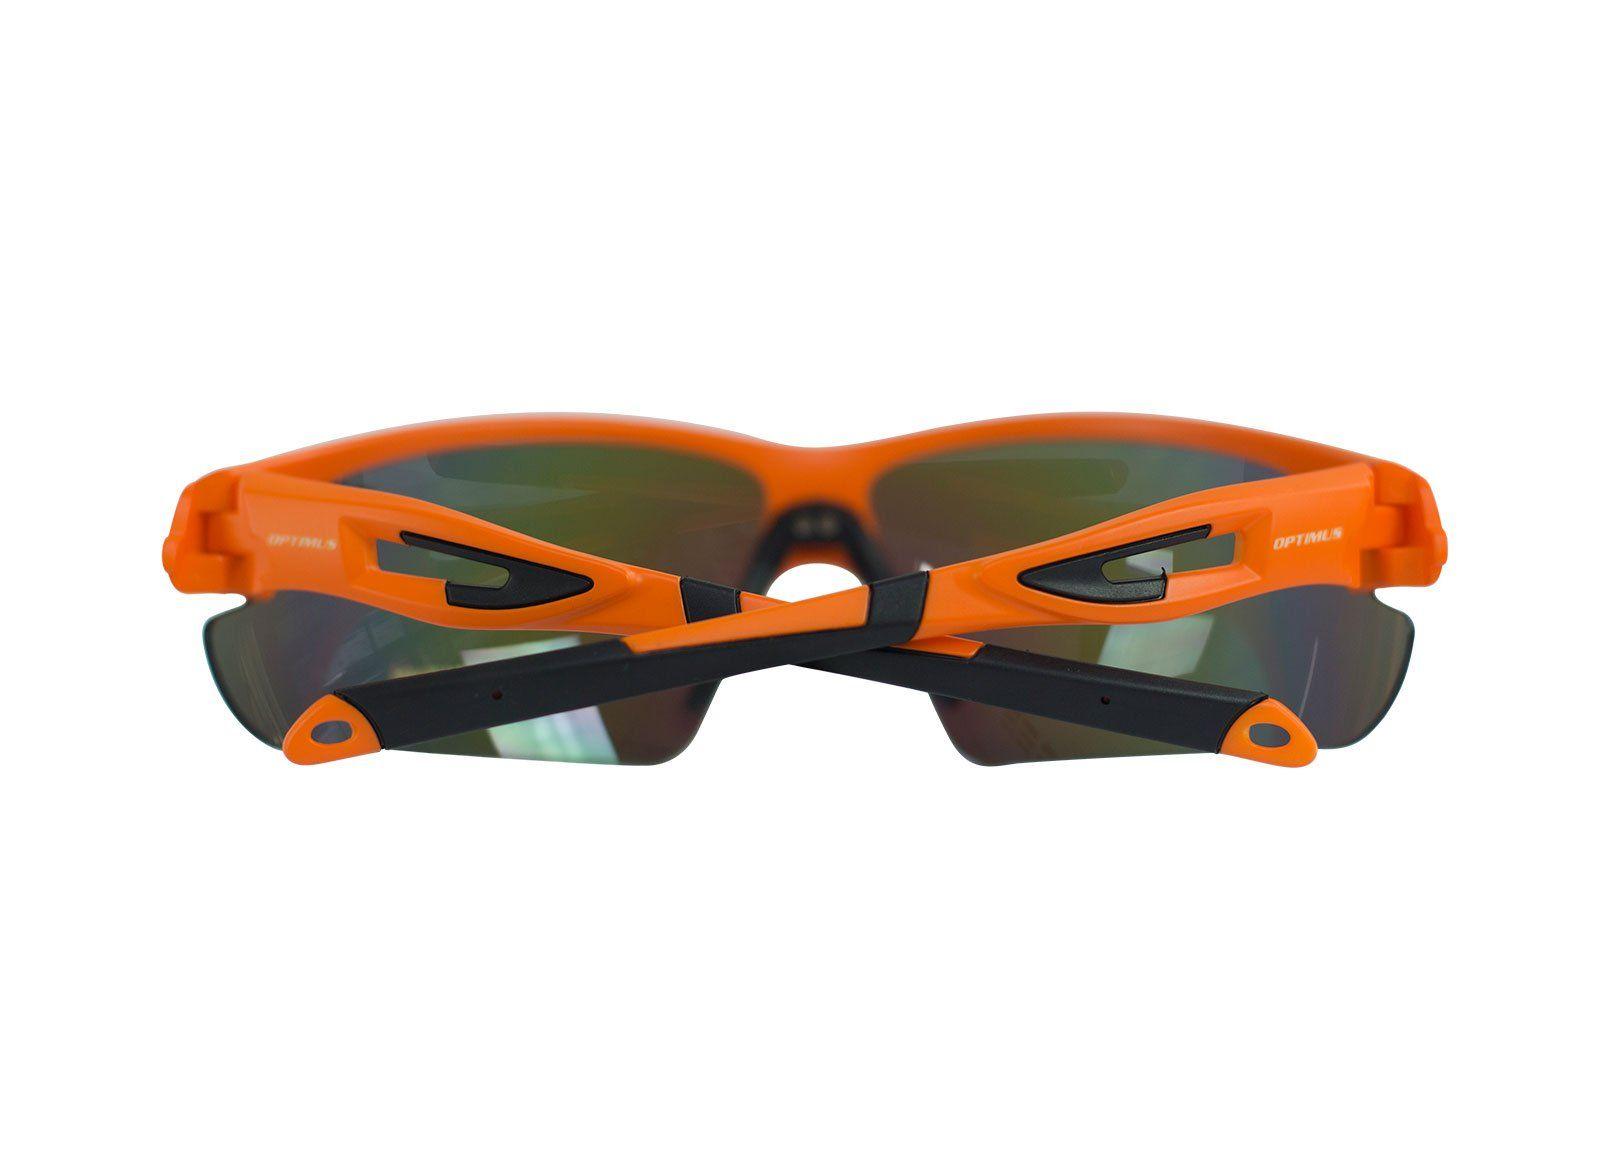 85a0db9f61 gafas para ciclismo marca optimus, gafas para mountain bike, gafas para MTB  y RUTA